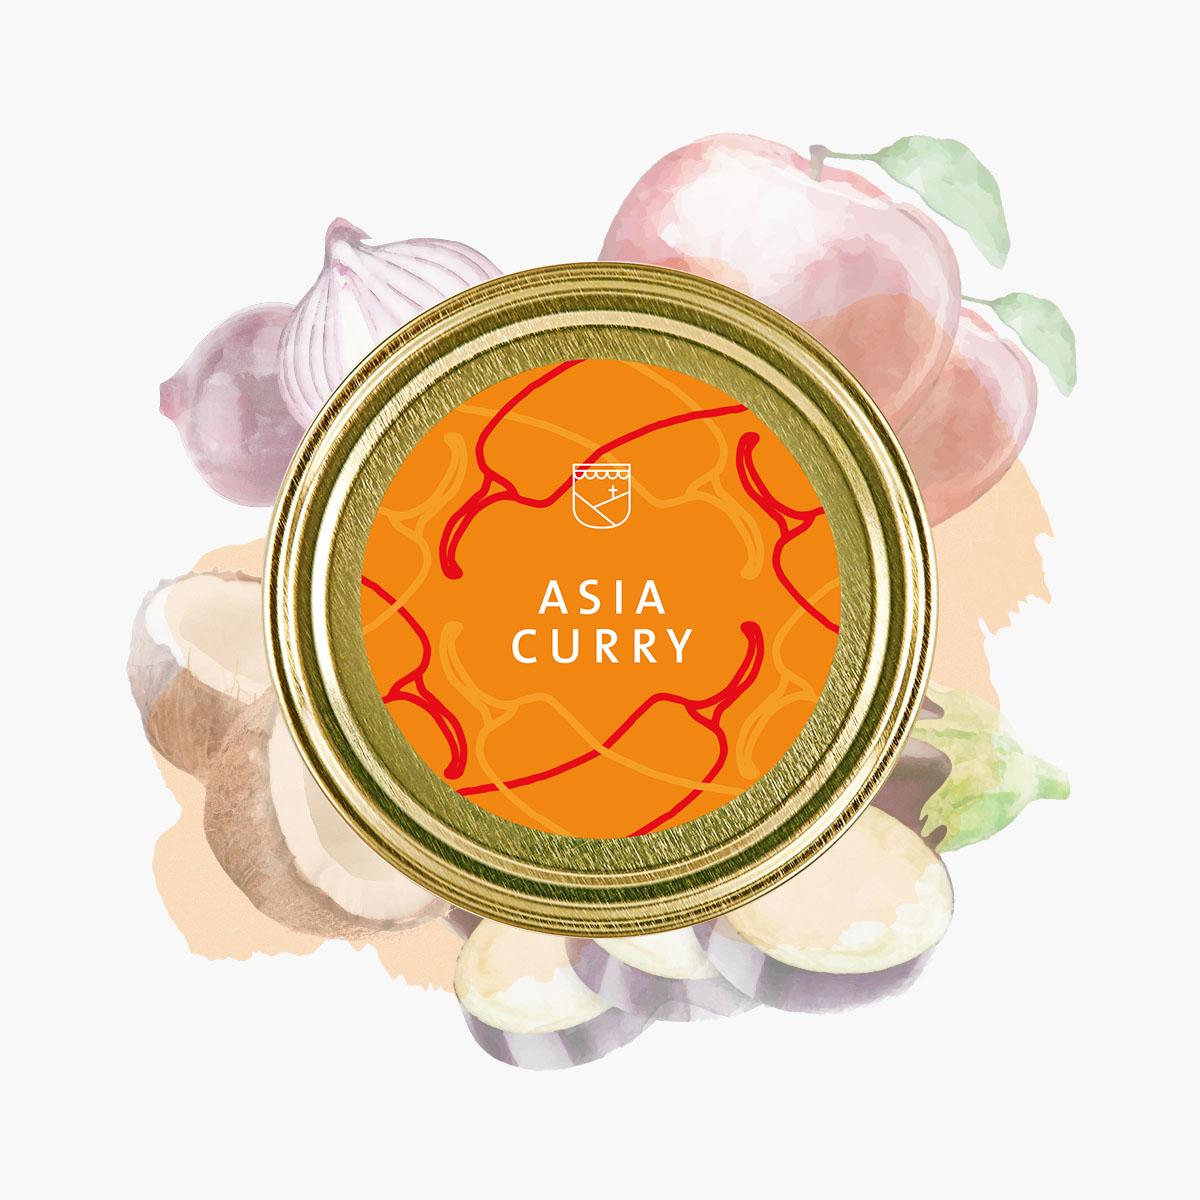 Asia Curry von Essendorfer